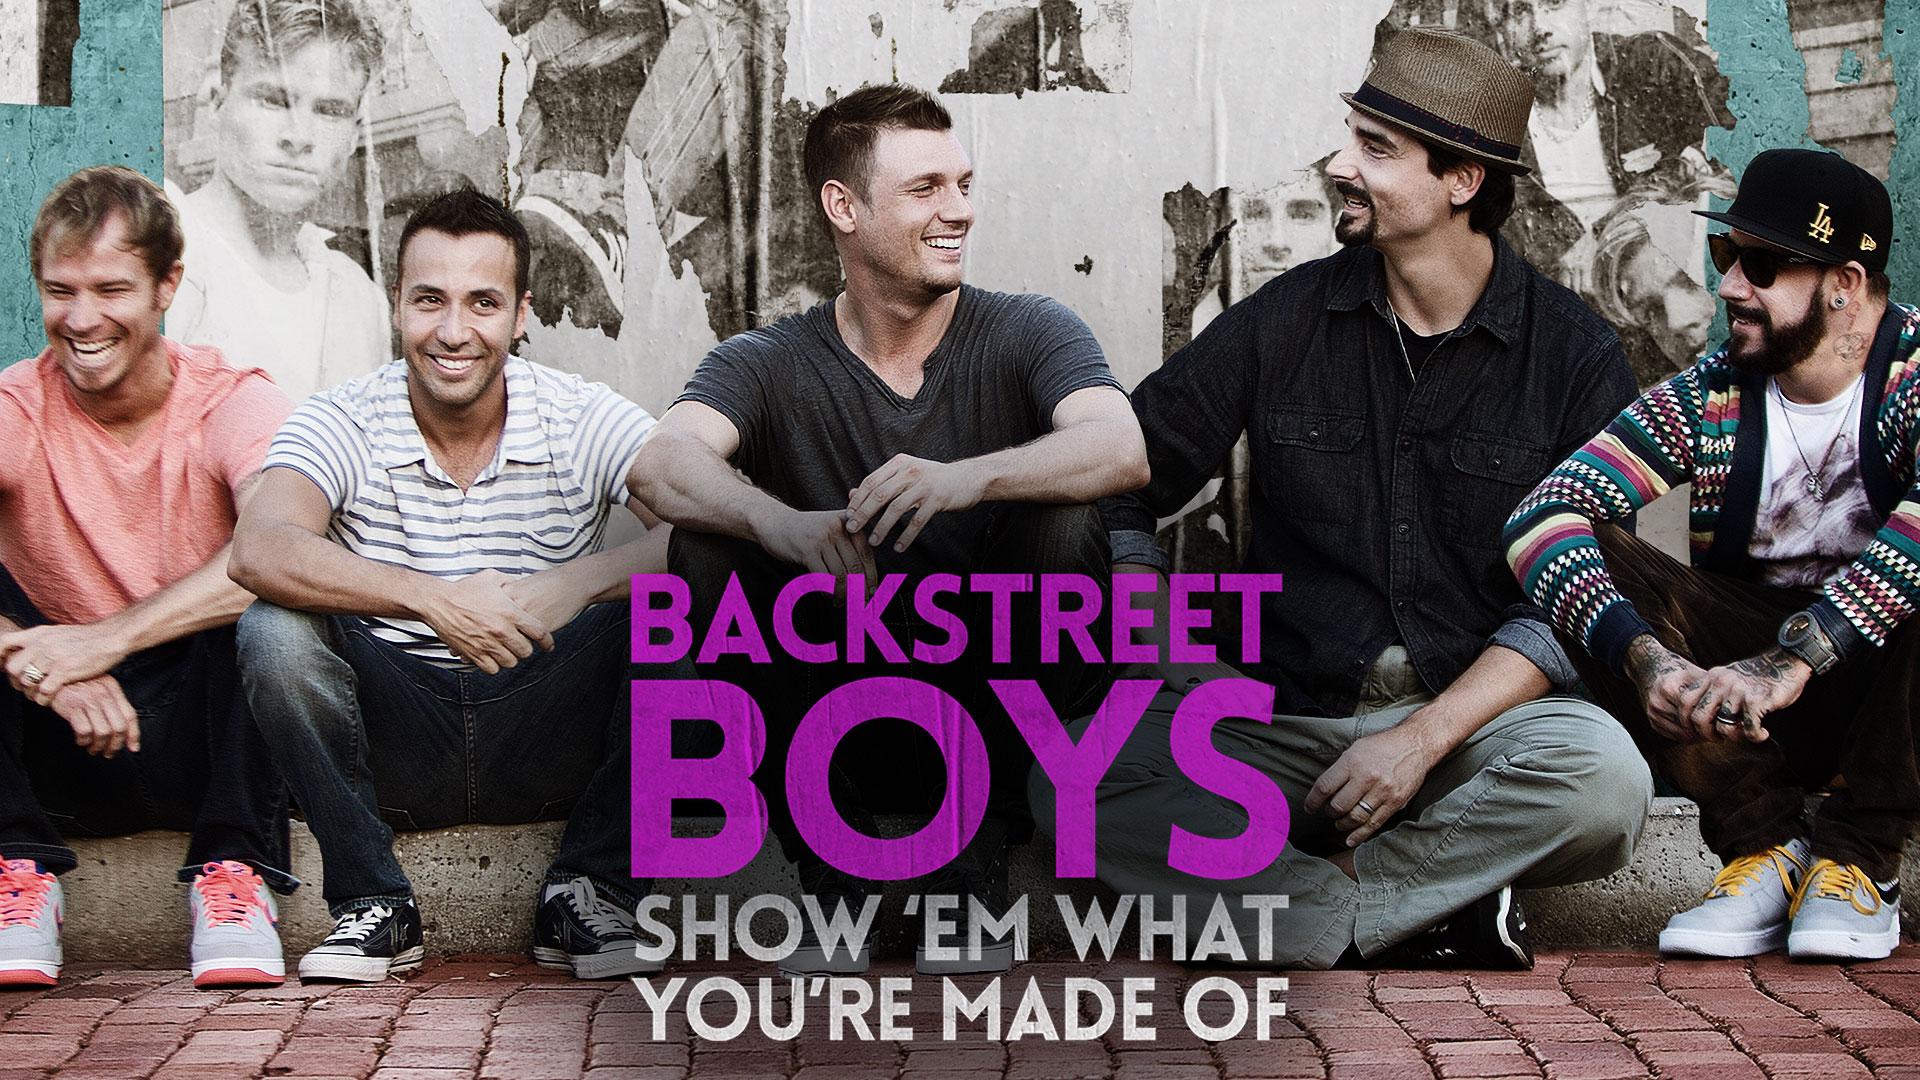 Backstreet Boys Snow 'em What You're Made of(字幕版)